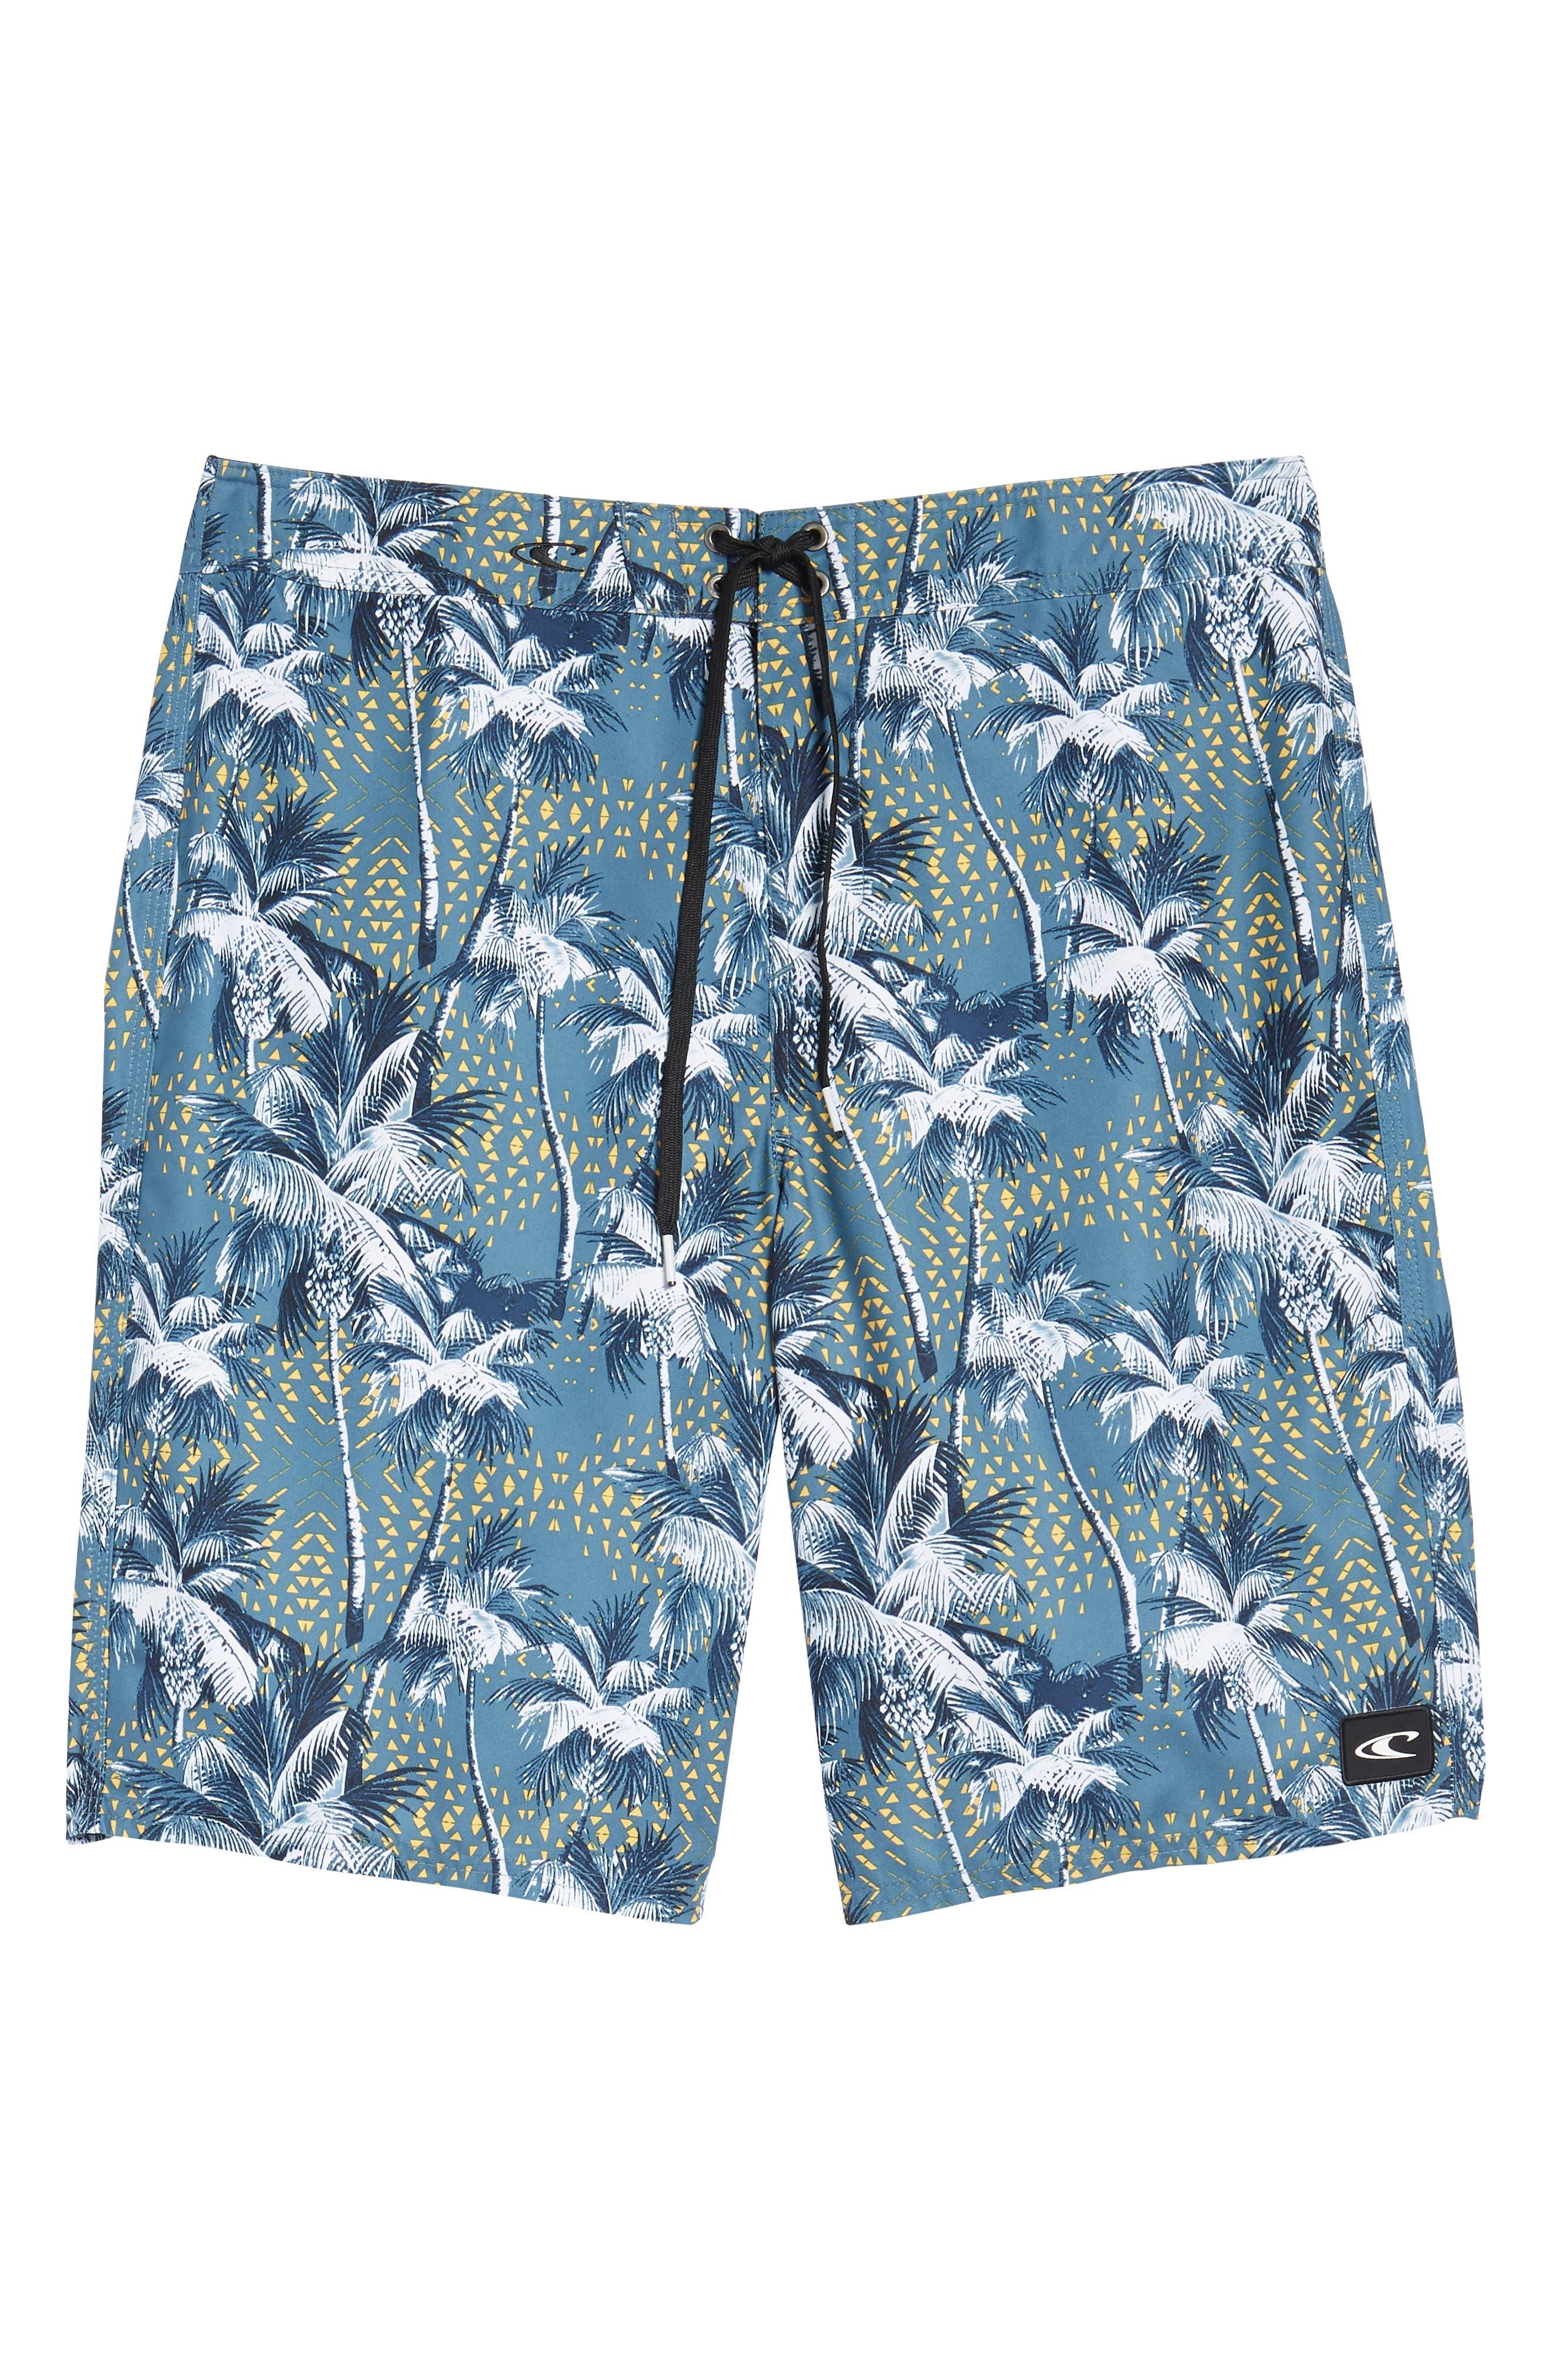 Darn Old Palmer Board Shorts,                             Alternate thumbnail 6, color,                             Dust Blue